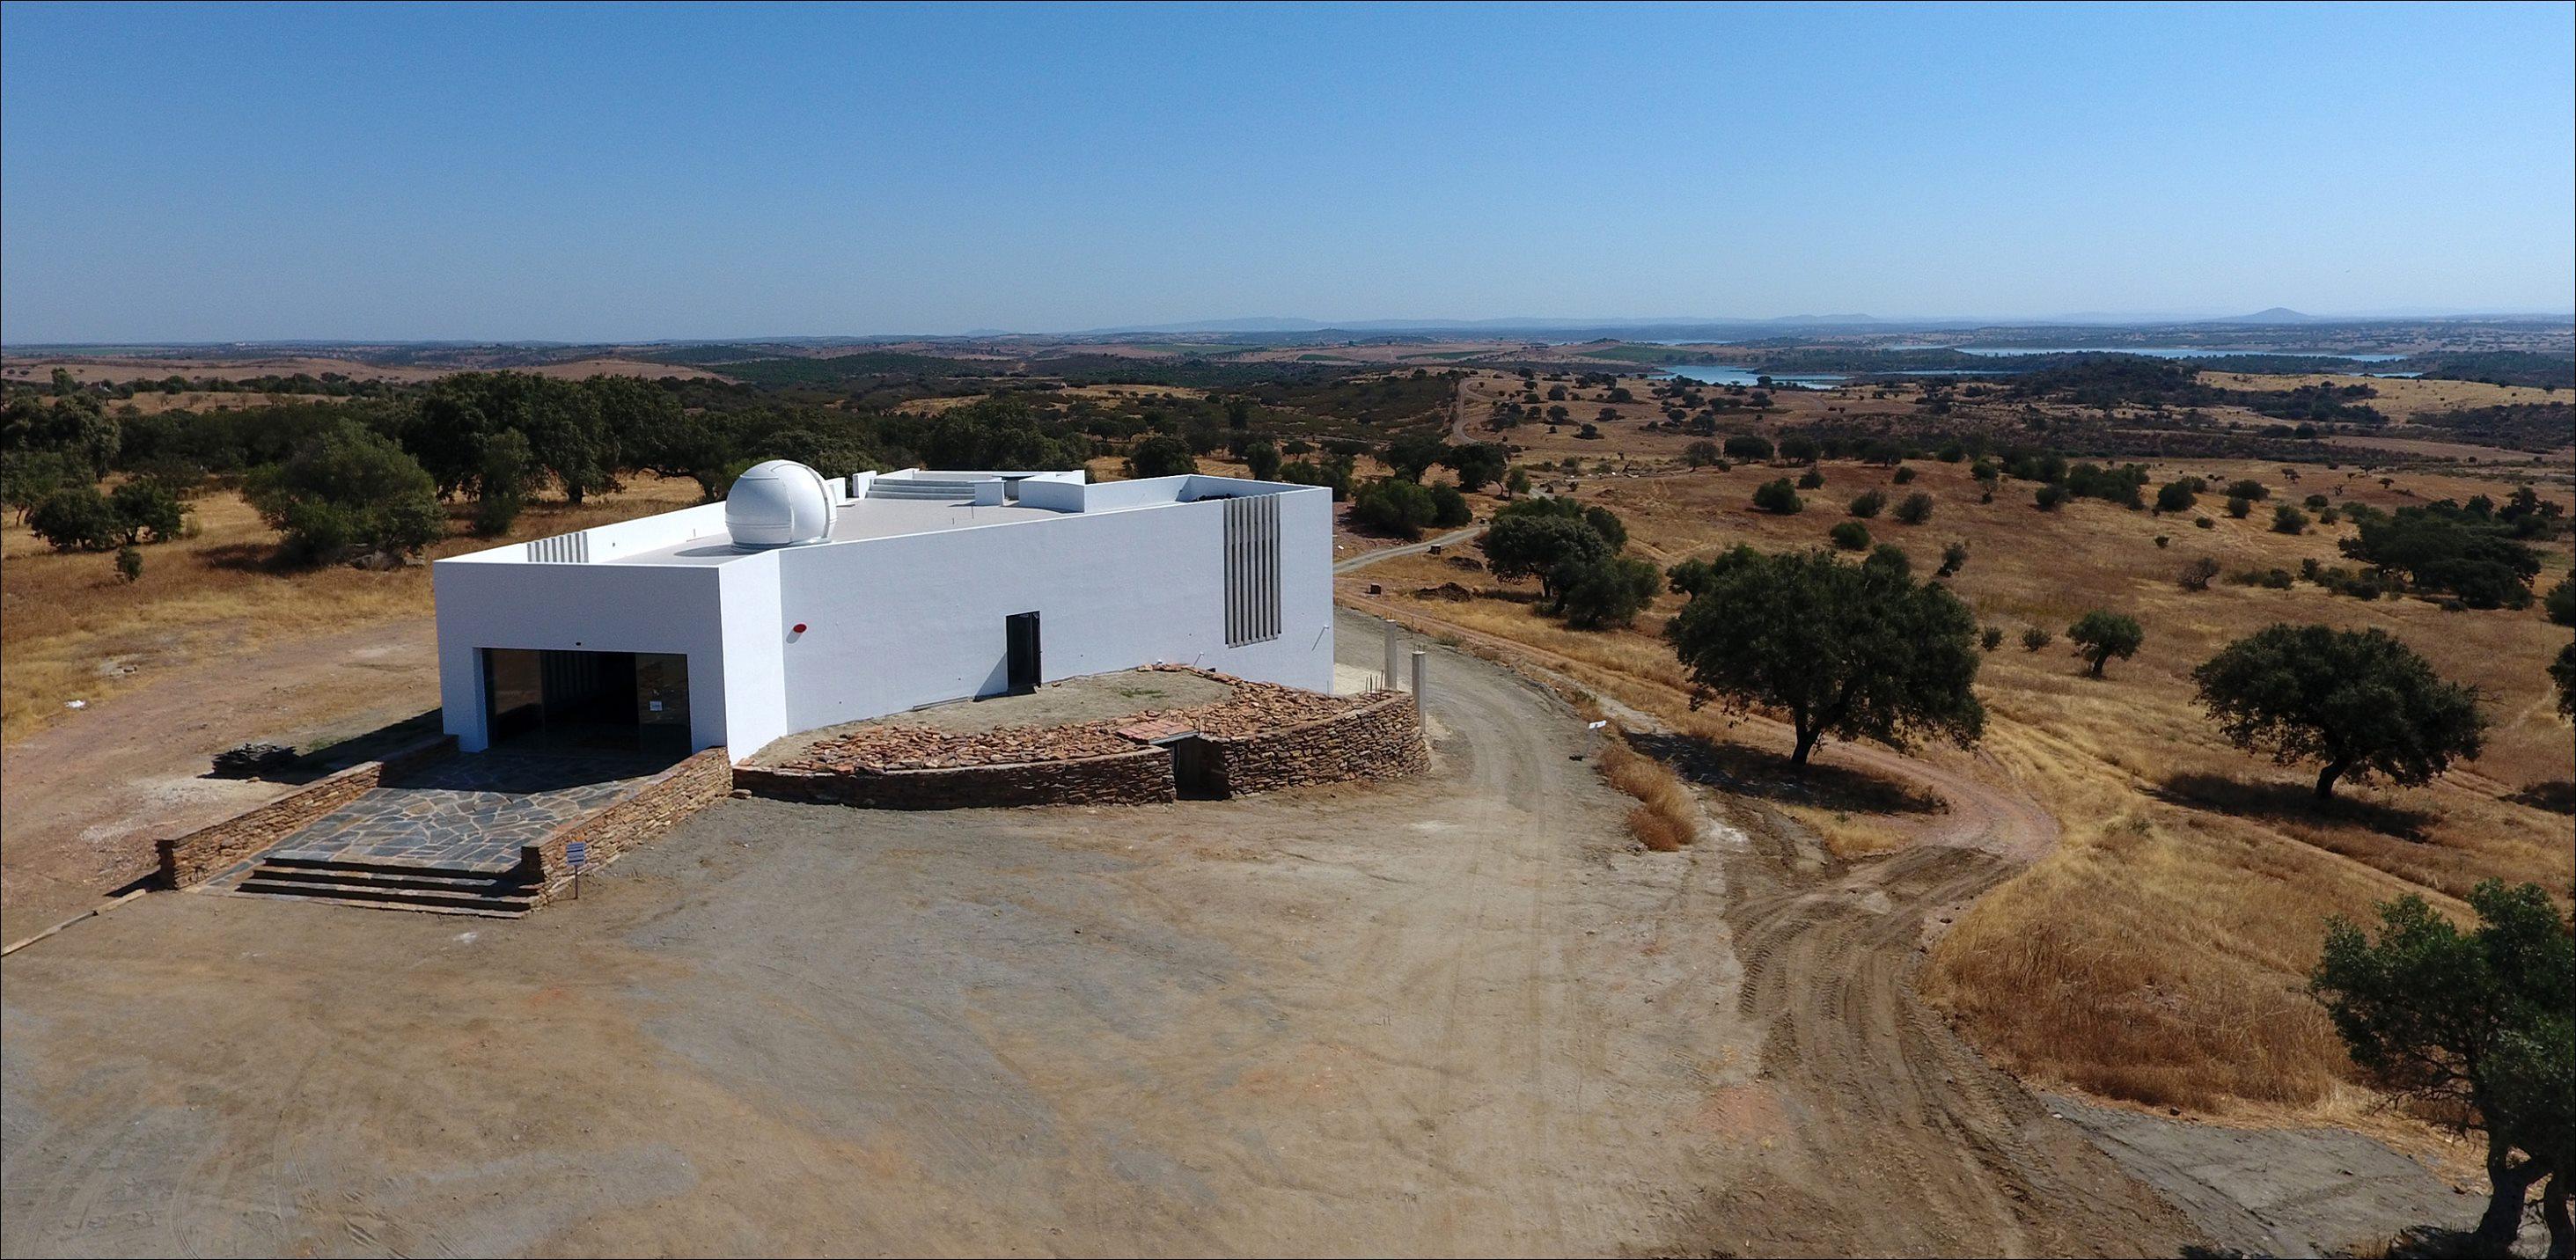 PMN-Portuguese Meteor Network and OLA-Observatório do Lago Alqueva agreement